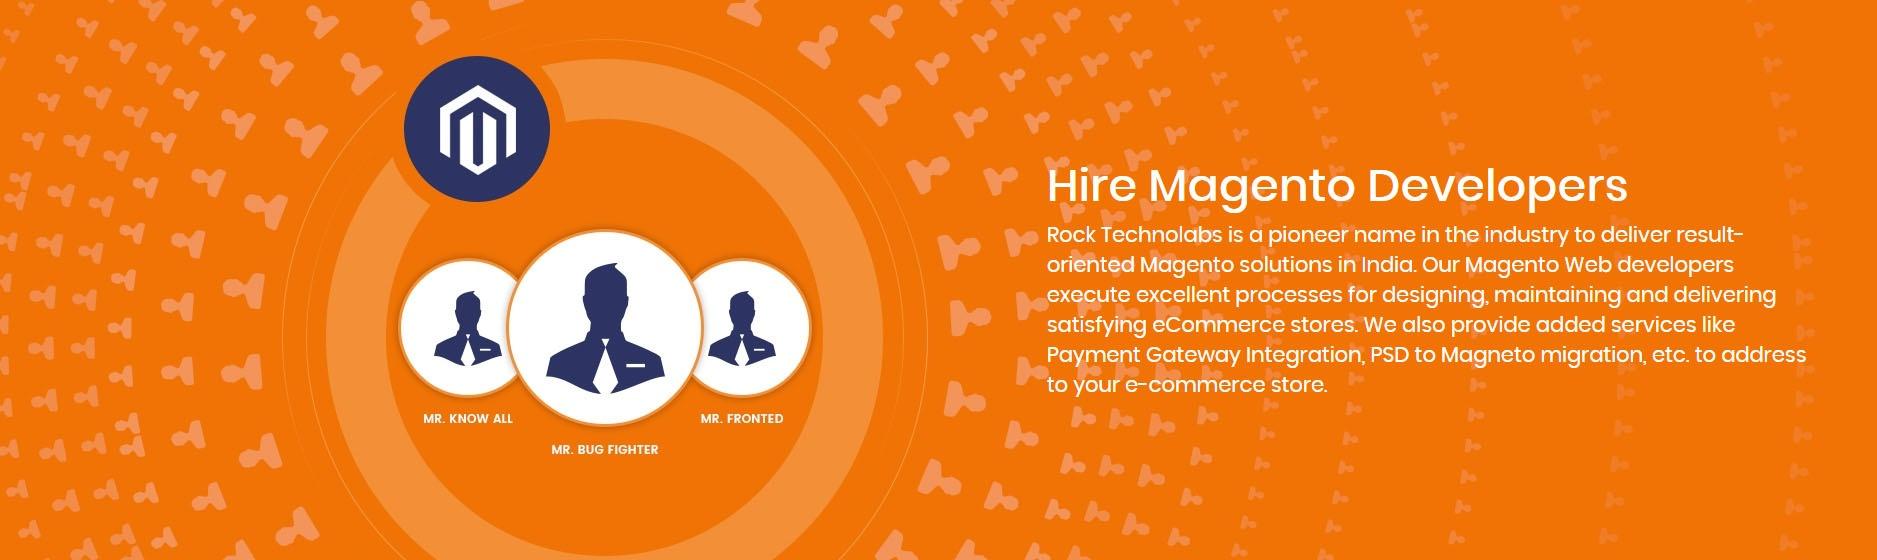 Magento News: Benefits of Hiring Magento Developers